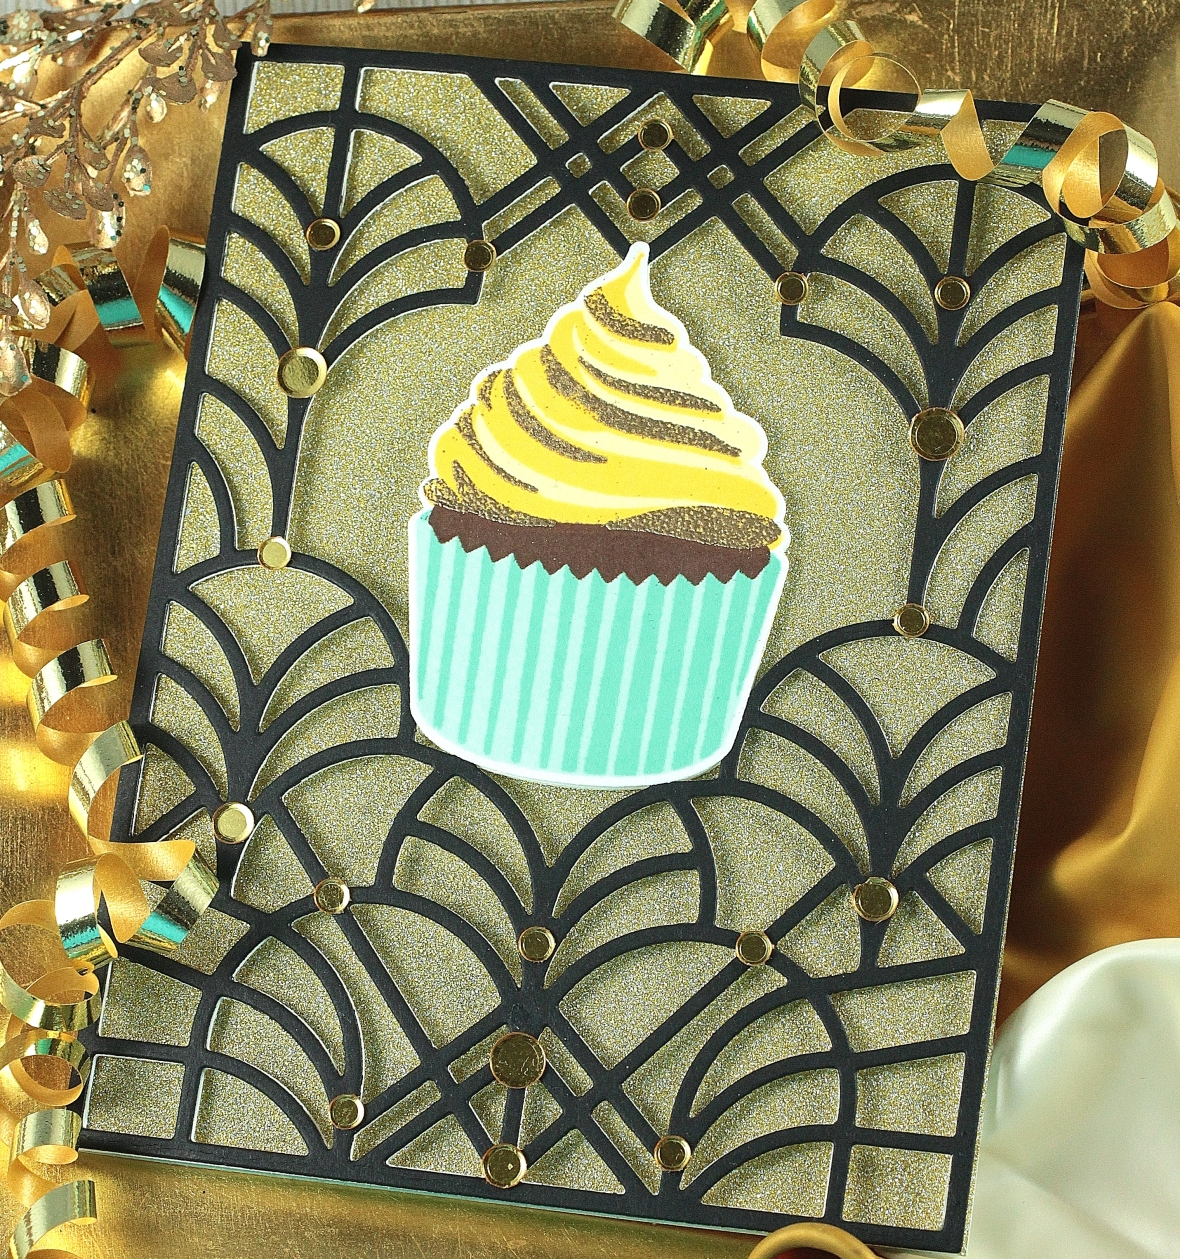 c4c 19 trifold cupcake